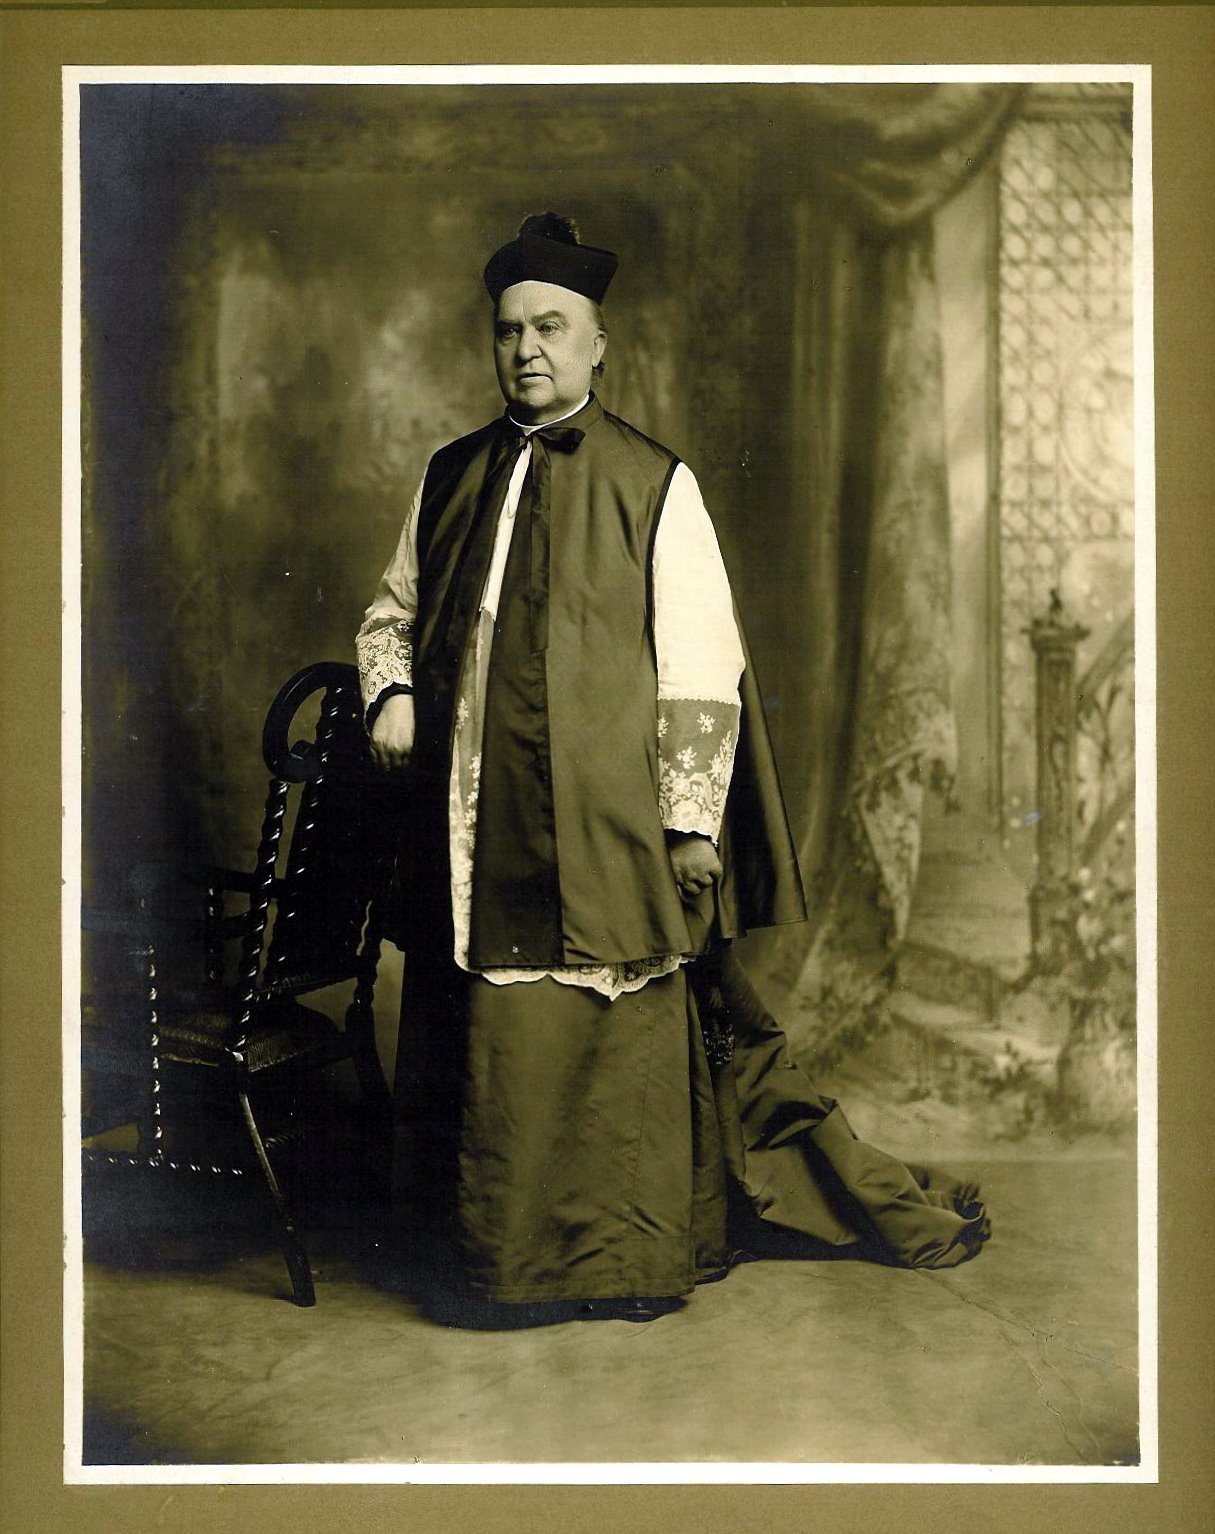 Monsignor George Bornemann black and white photo